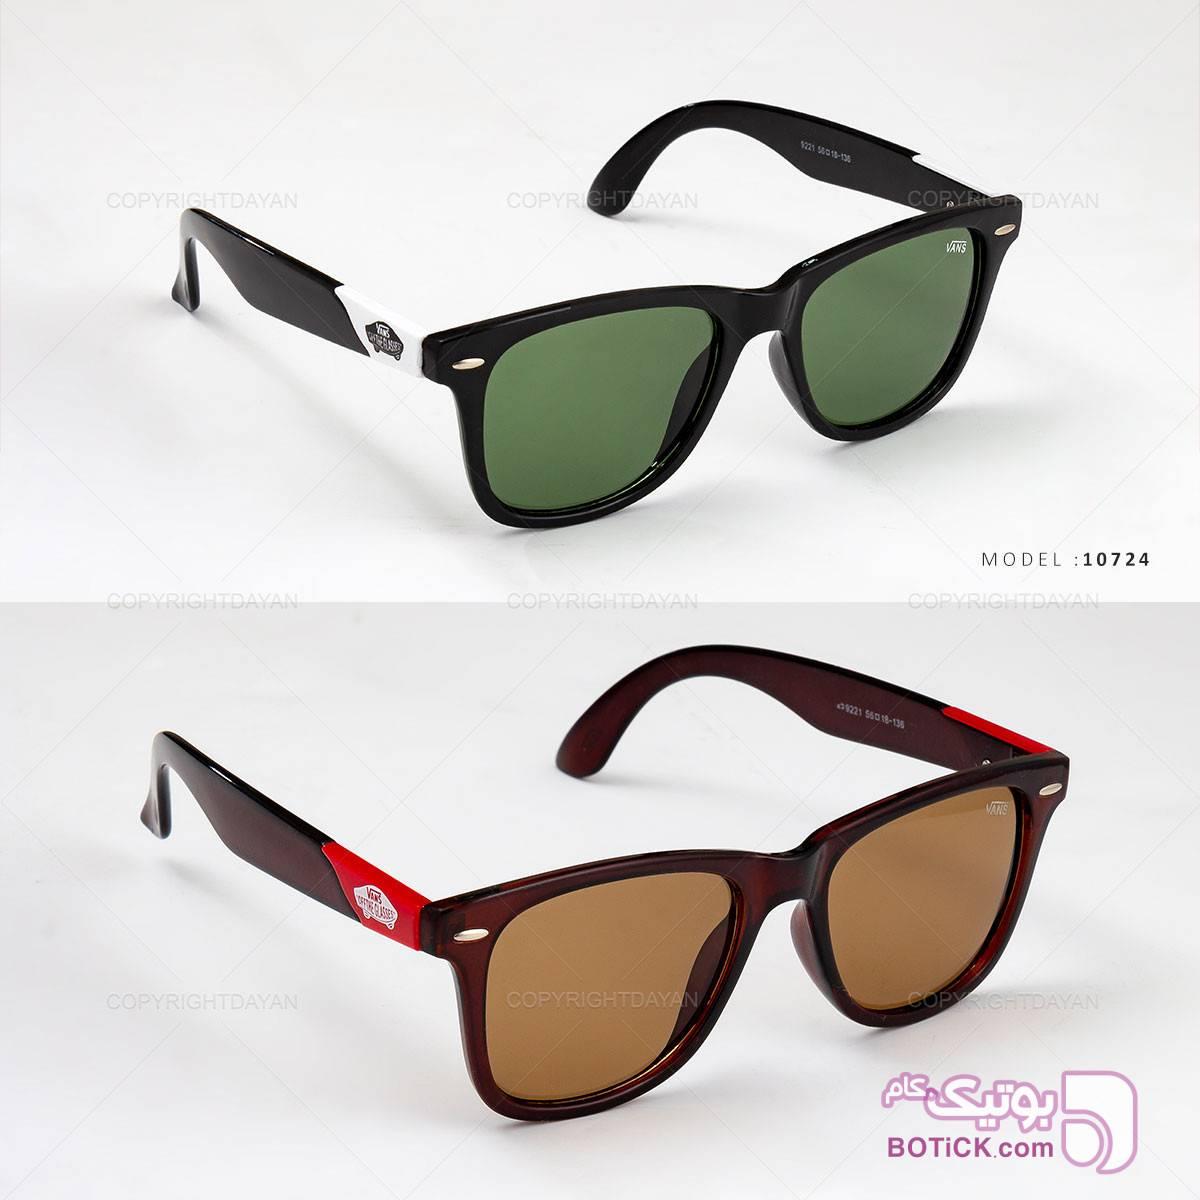 عینک آفتابی Vans مدل 10724  مشکی عینک آفتابی